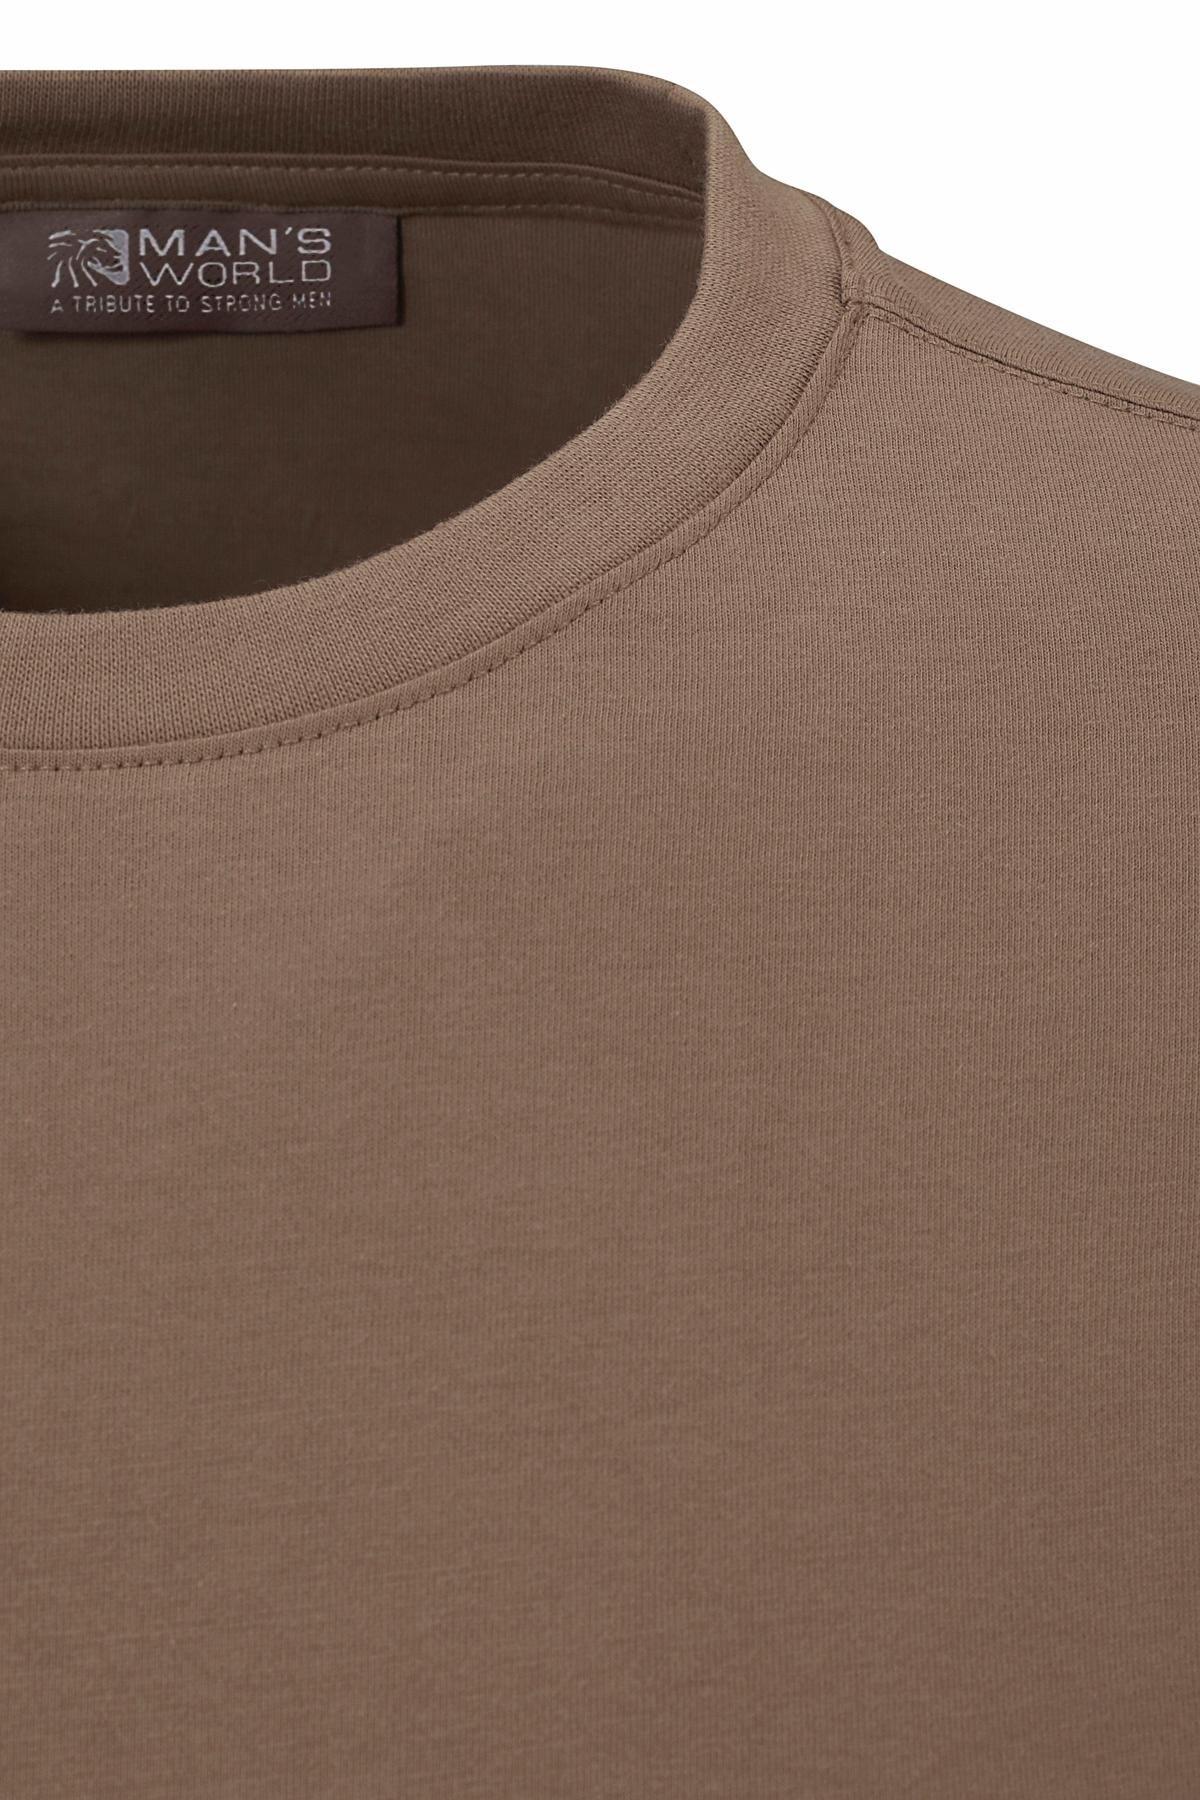 Online 2 1 Grey T shirt Connection Gratis Verkrijgbaar y7vYbgf6